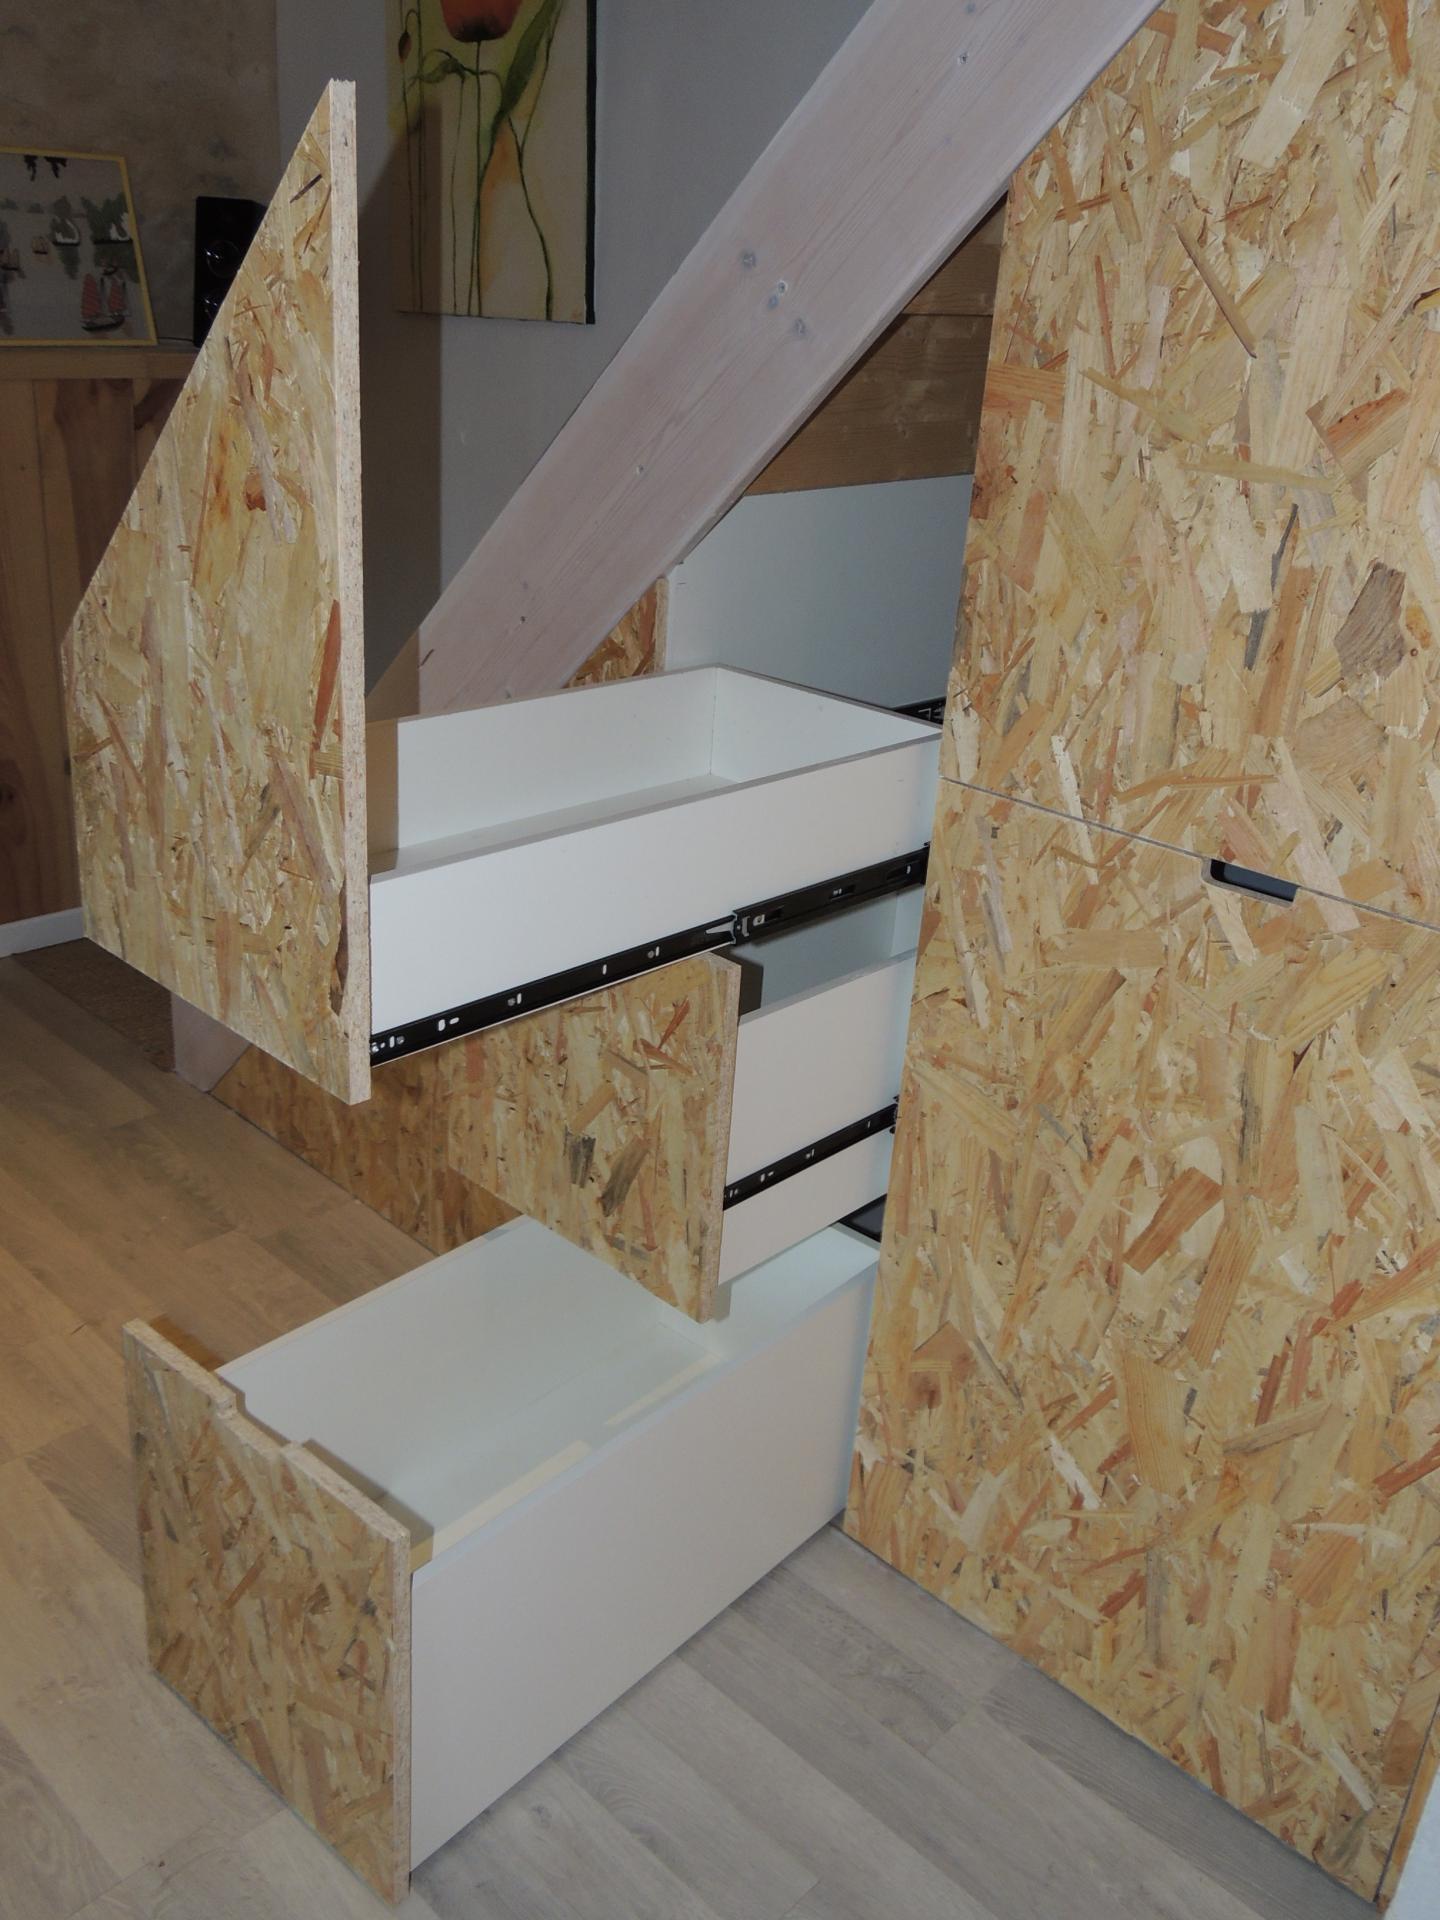 bispoke under stairs - www.ateliercannelle.com